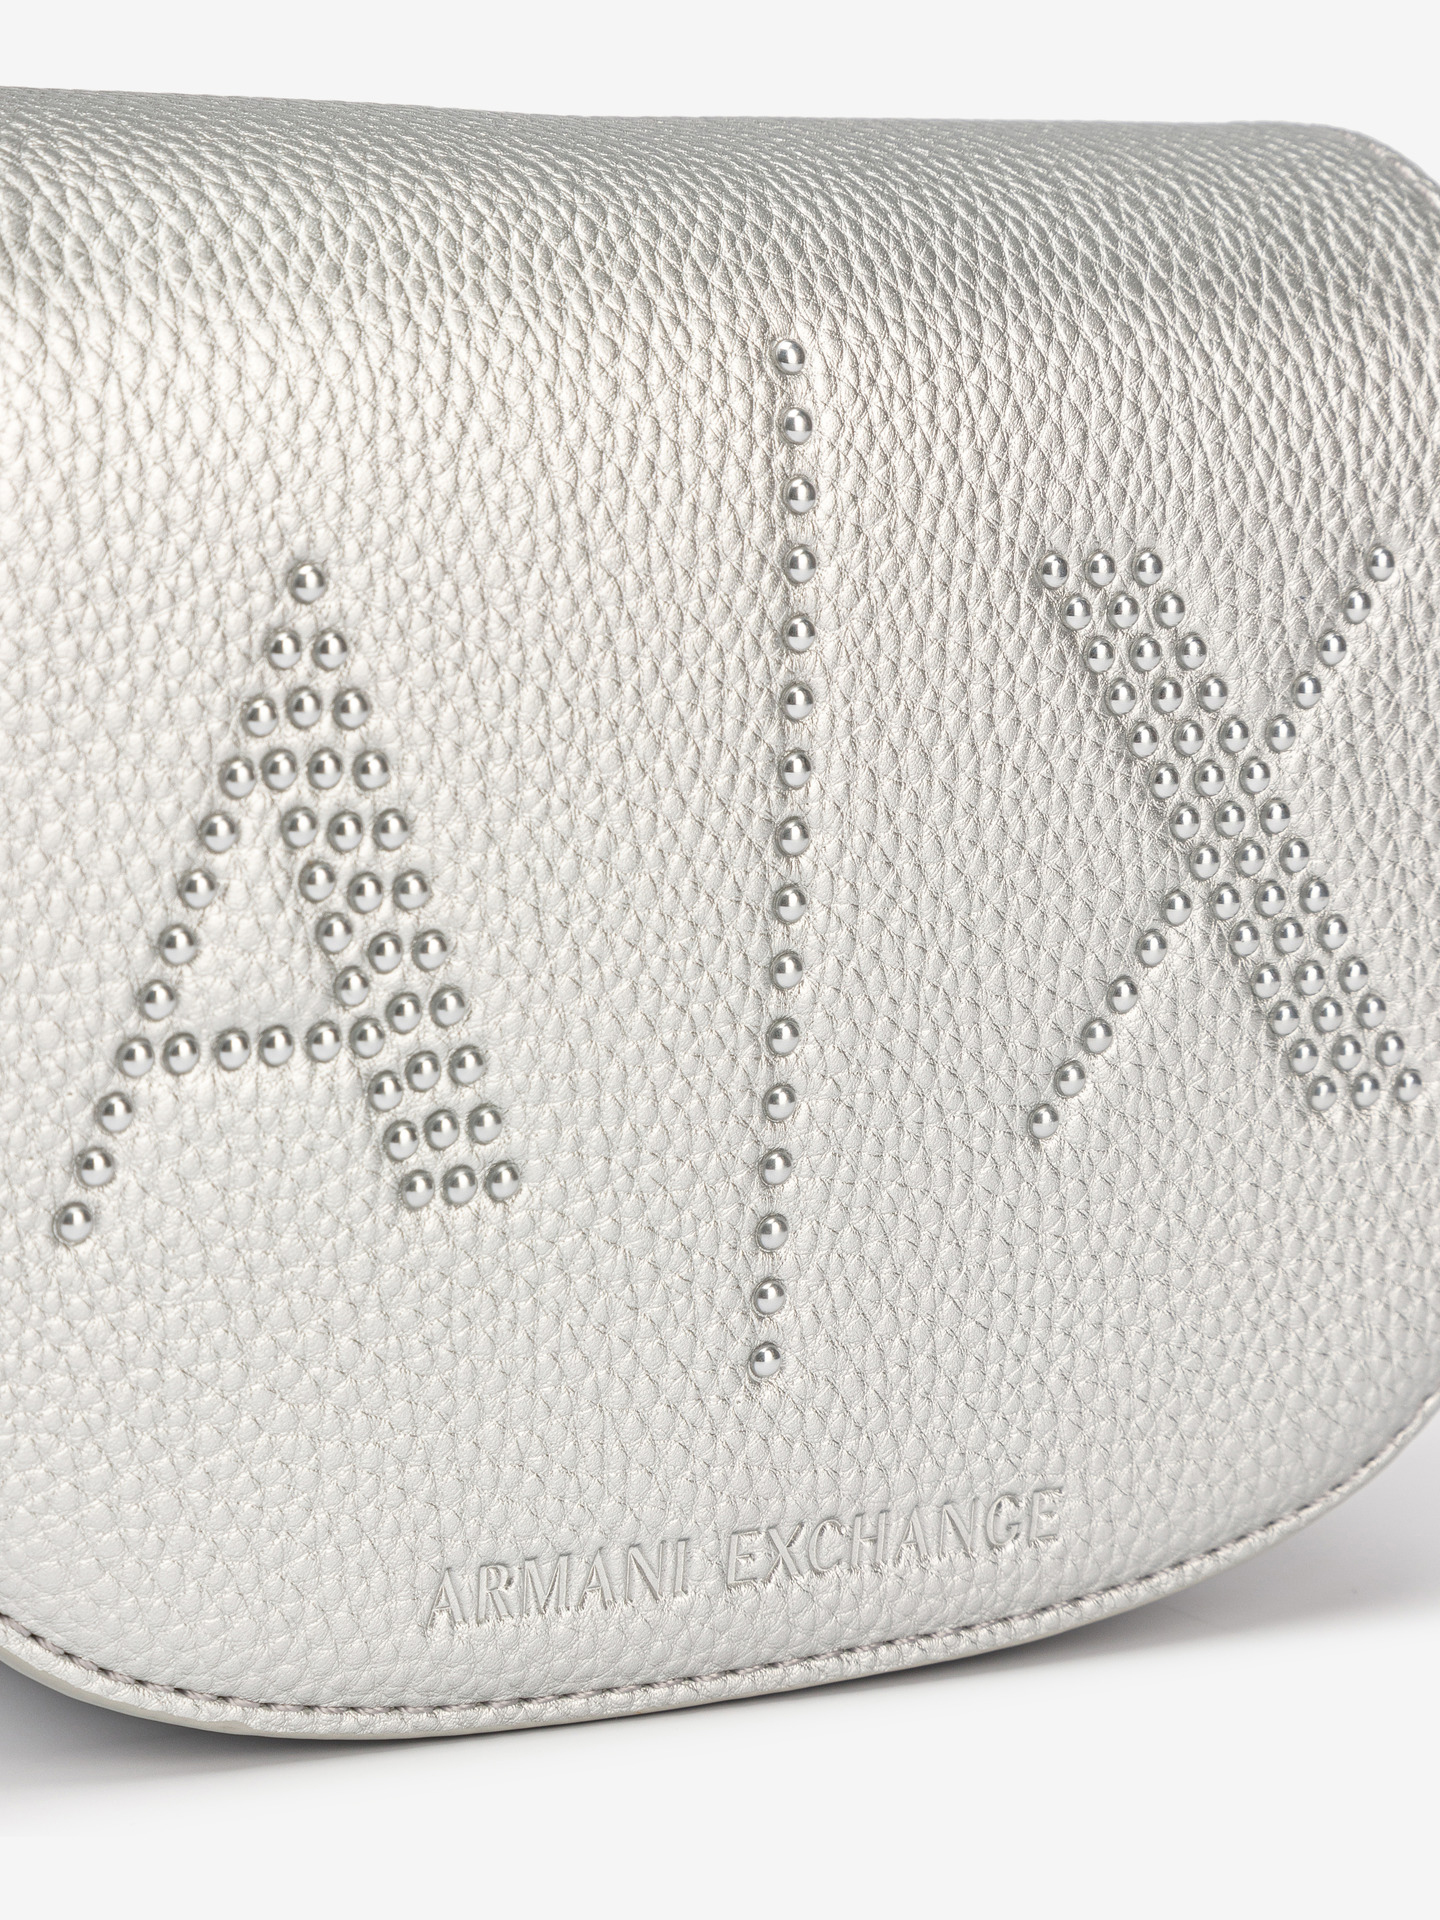 Armani Exchange argintii geanta